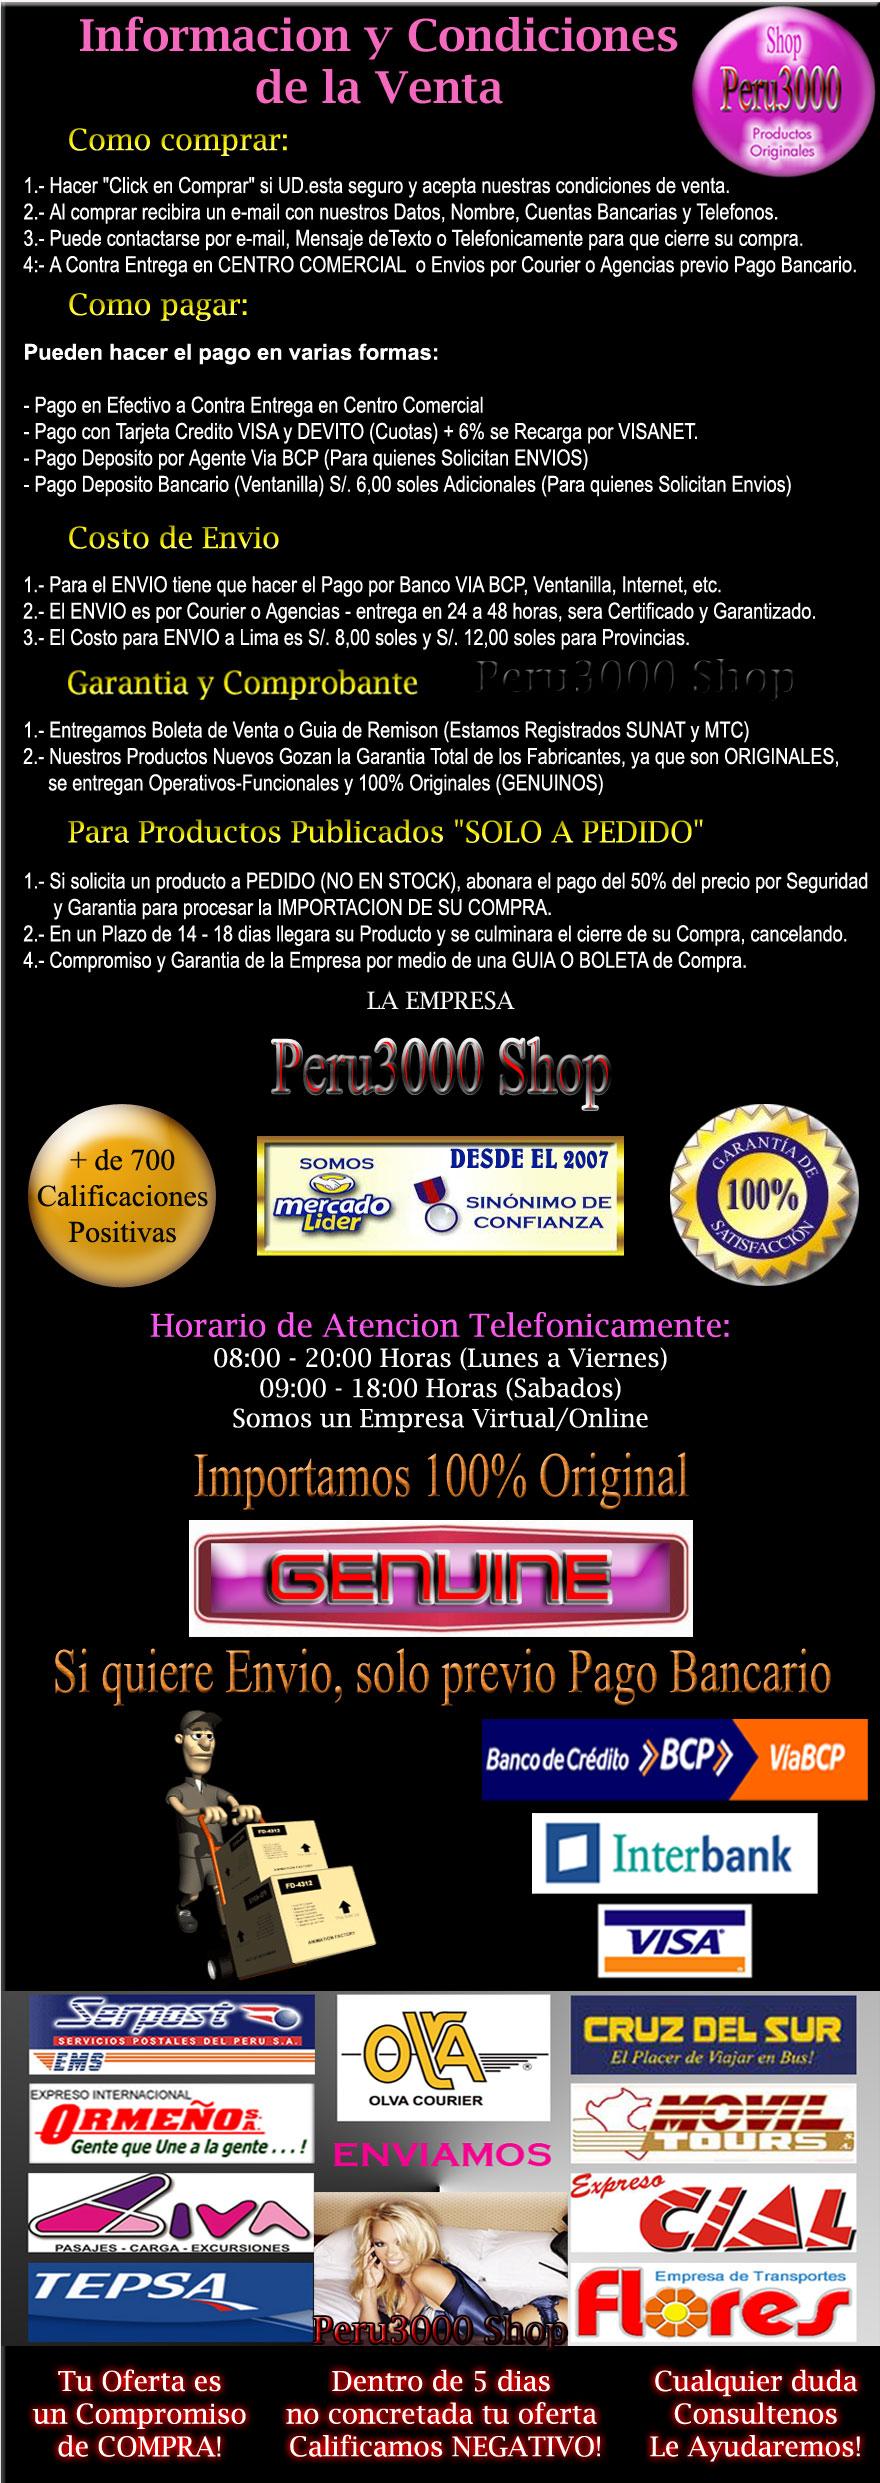 http://www.peru3000.com/CONDICIONESPERU3000.jpg